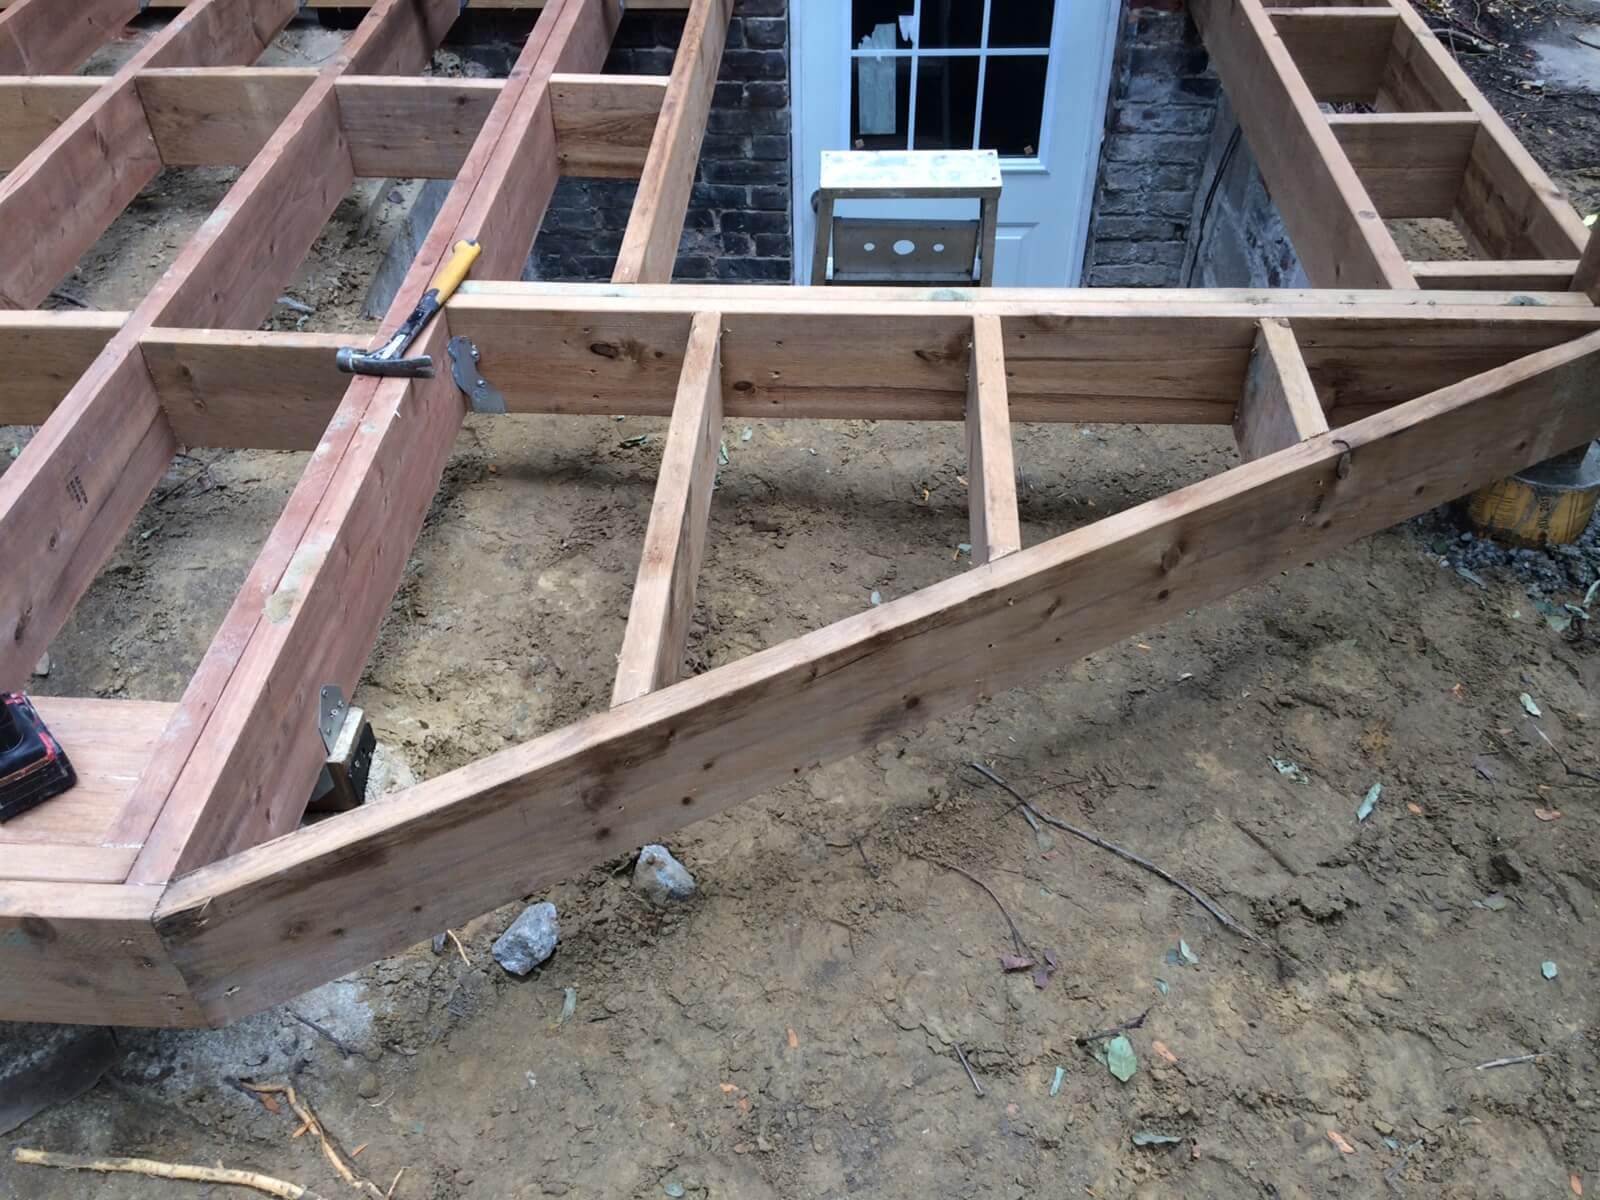 Basement-Waterproofing-Company-Toronto-Alhambra-Ave-4